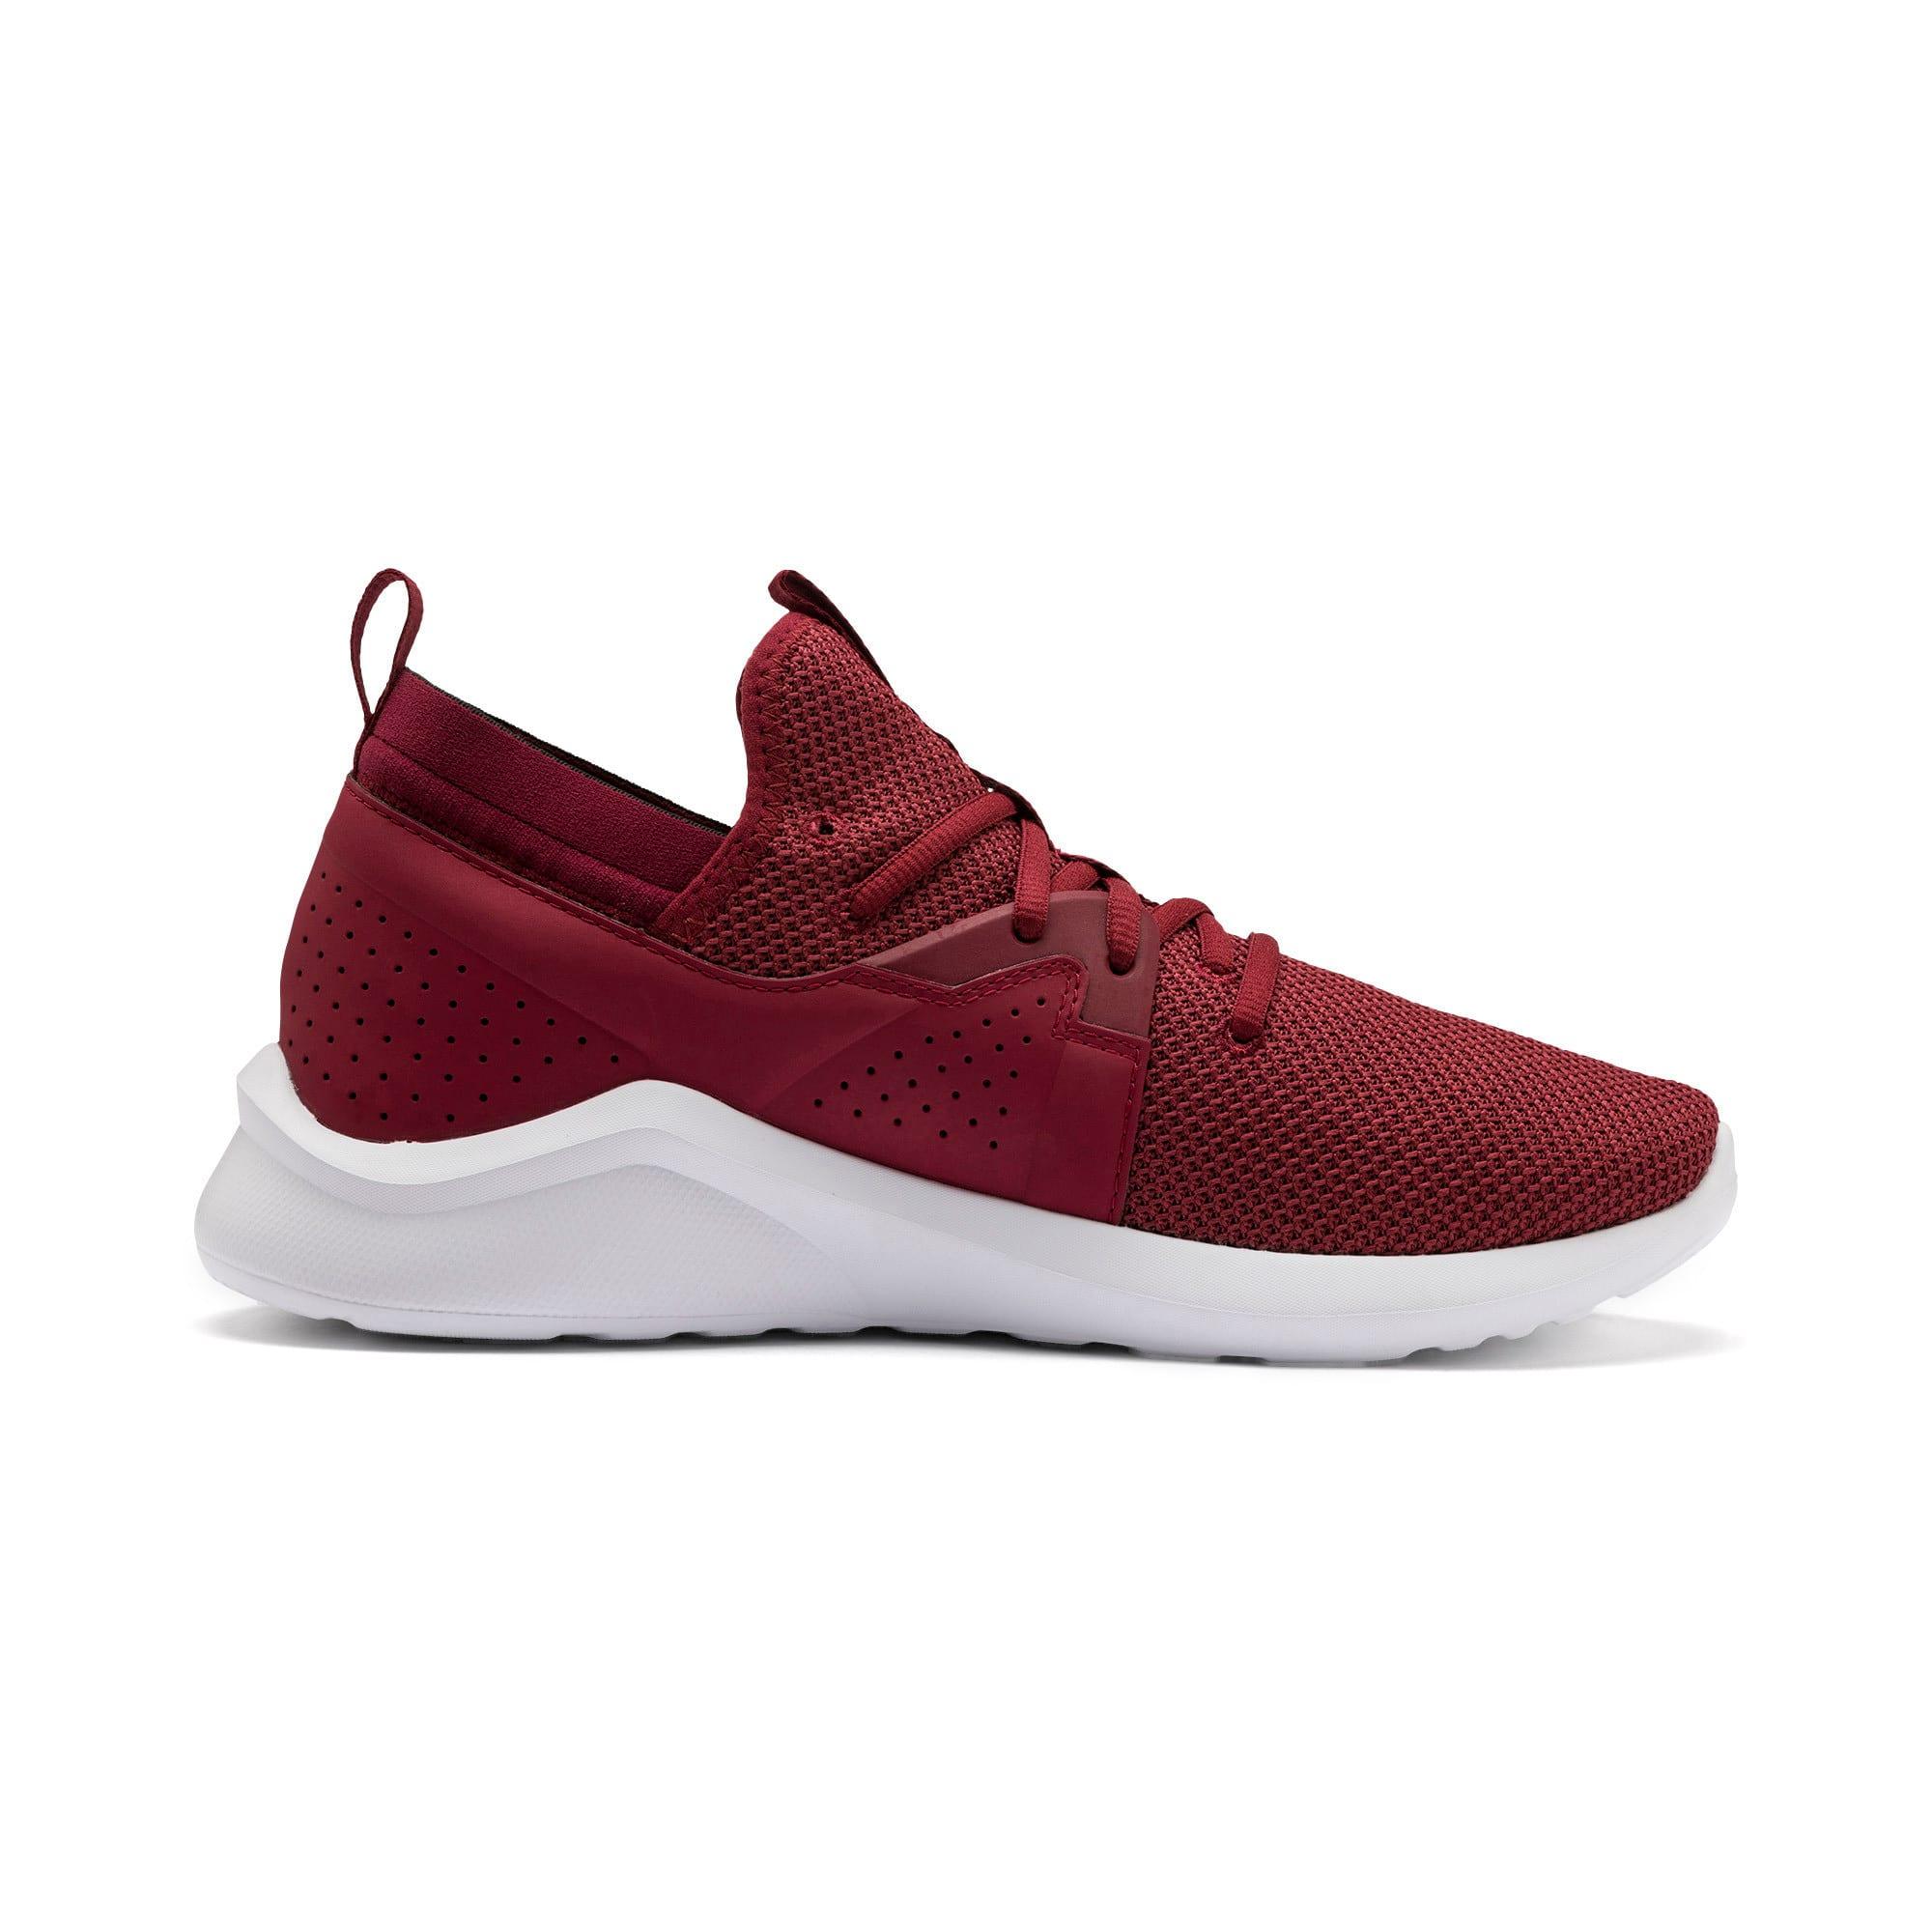 Thumbnail 7 of Emergence Men's Running Shoes, Rhubarb-Puma White, medium-IND